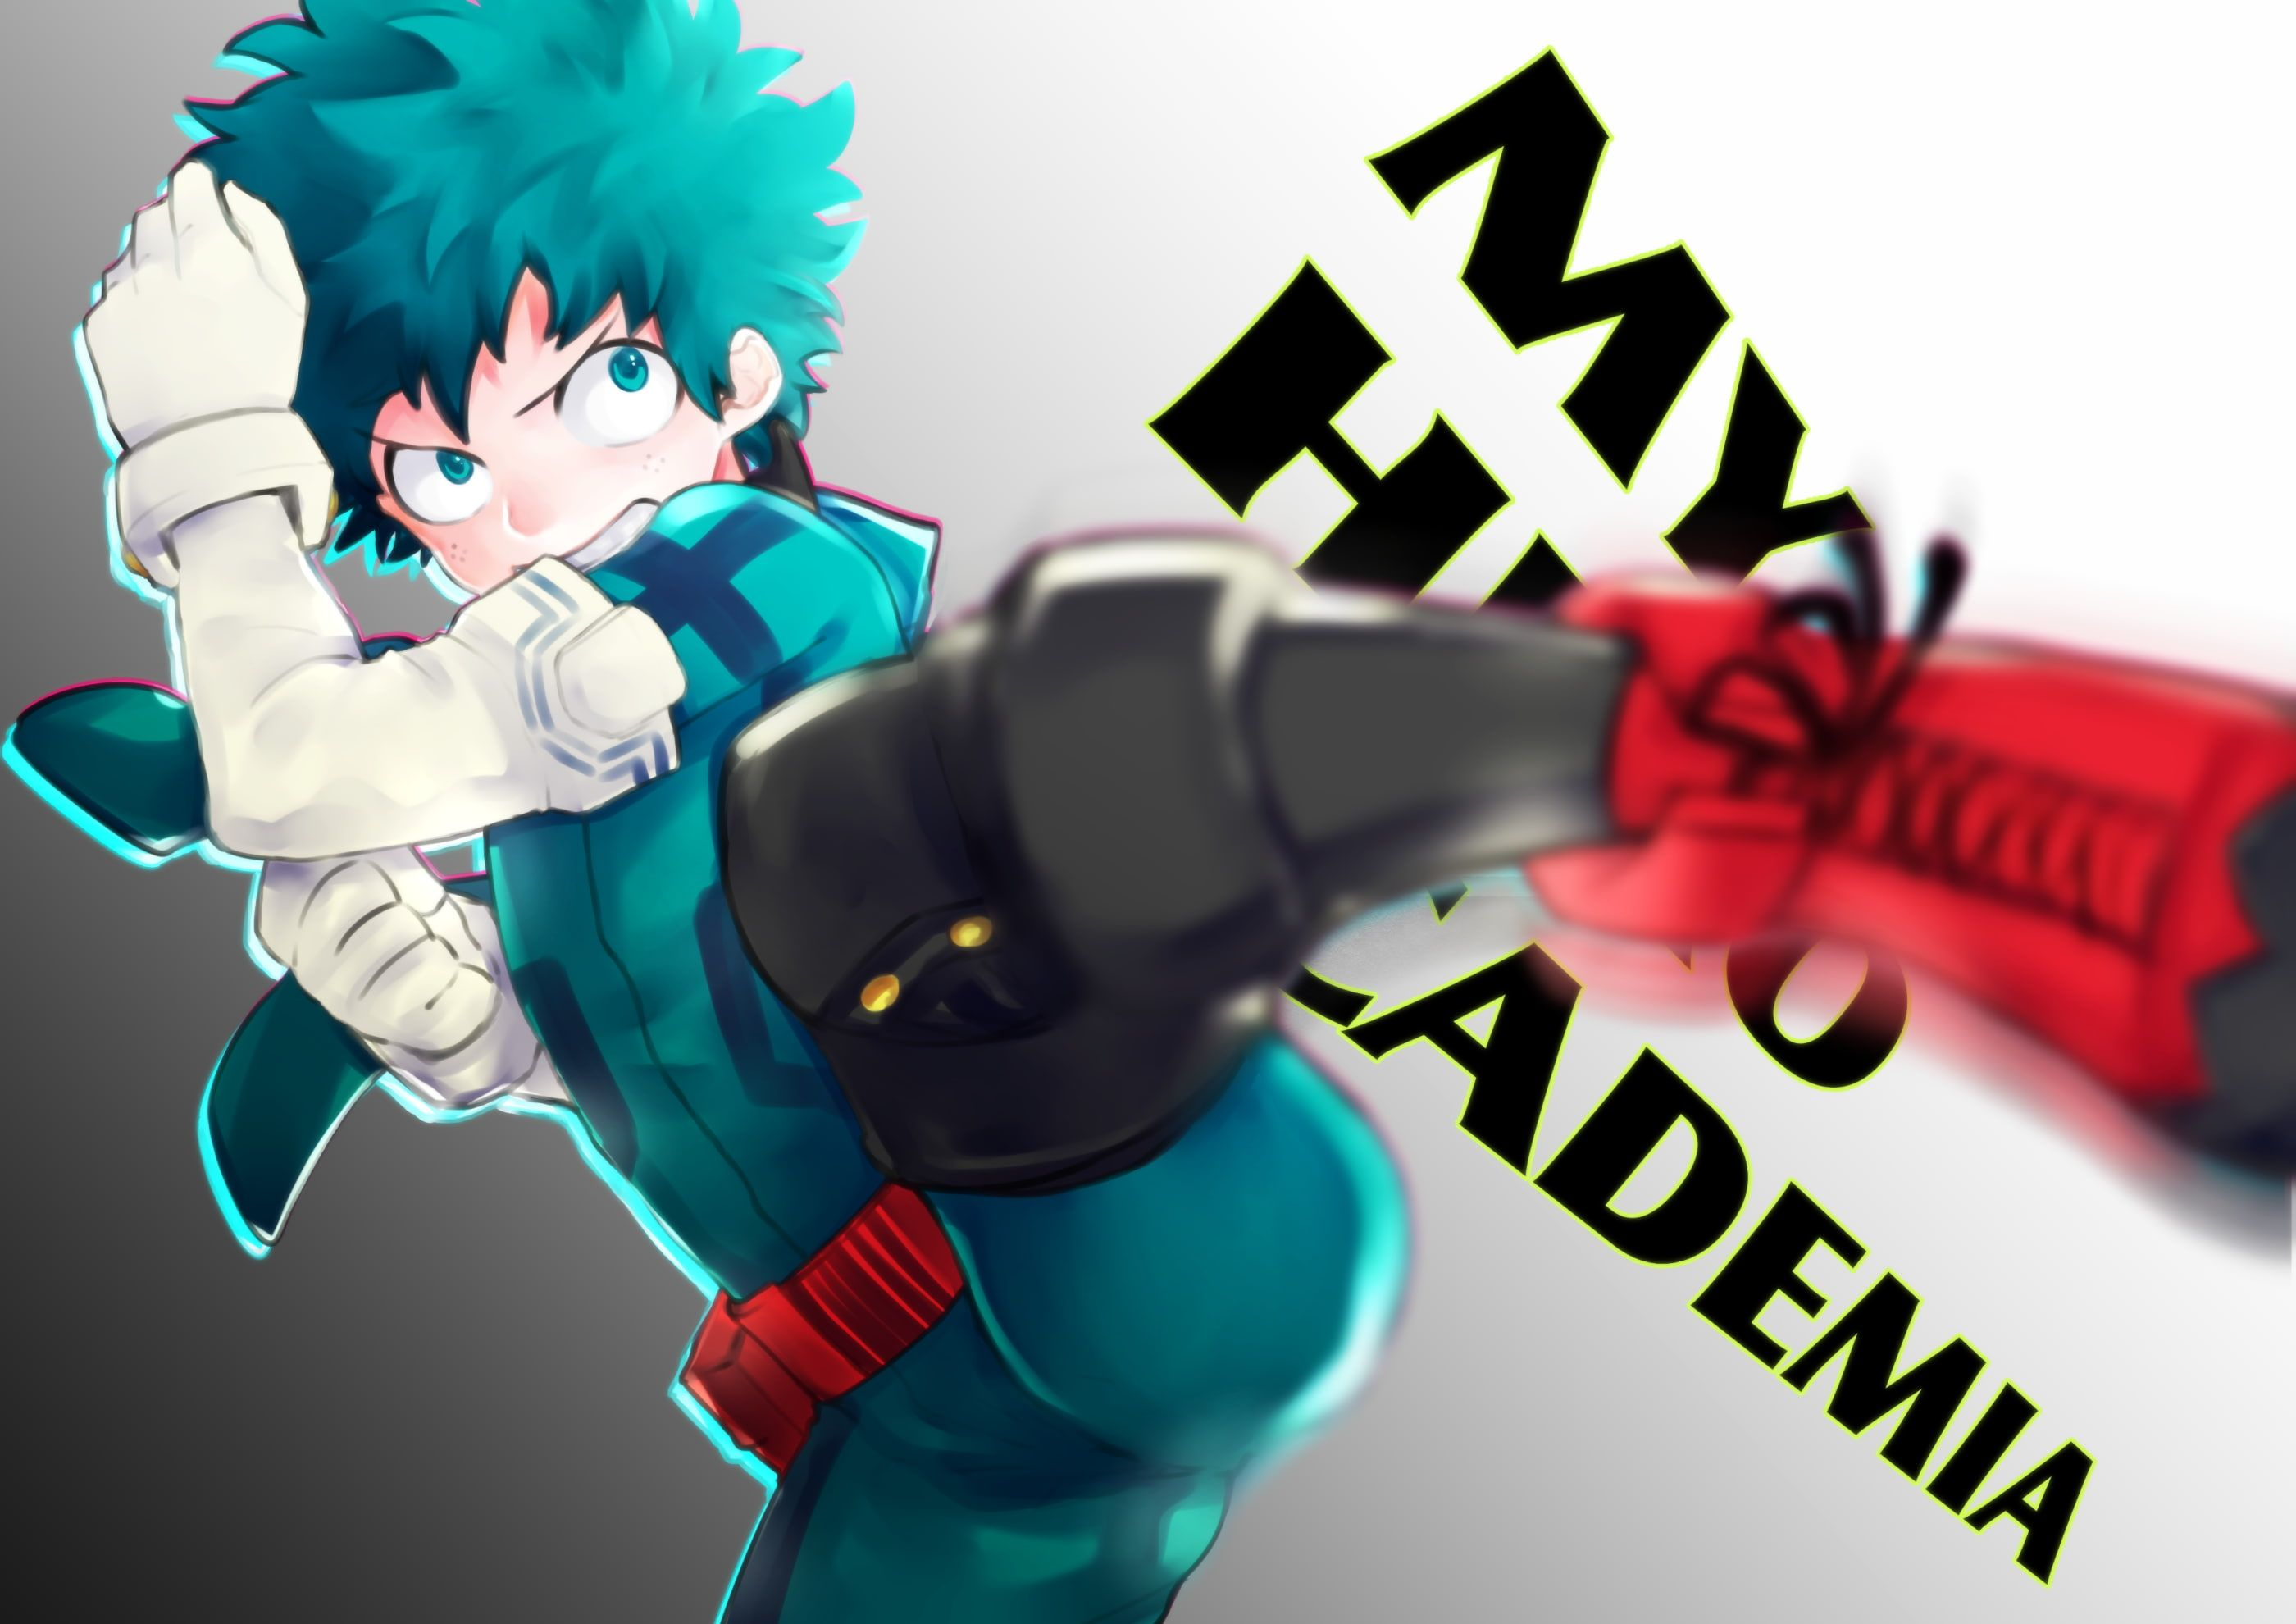 Boku No Hero Academia Izuku Midoriya Bodysuit Kick Fight Anime 2k Wallpaper Hdwallpaper Desktop Boku No Hero Academia My Hero Academia My Hero